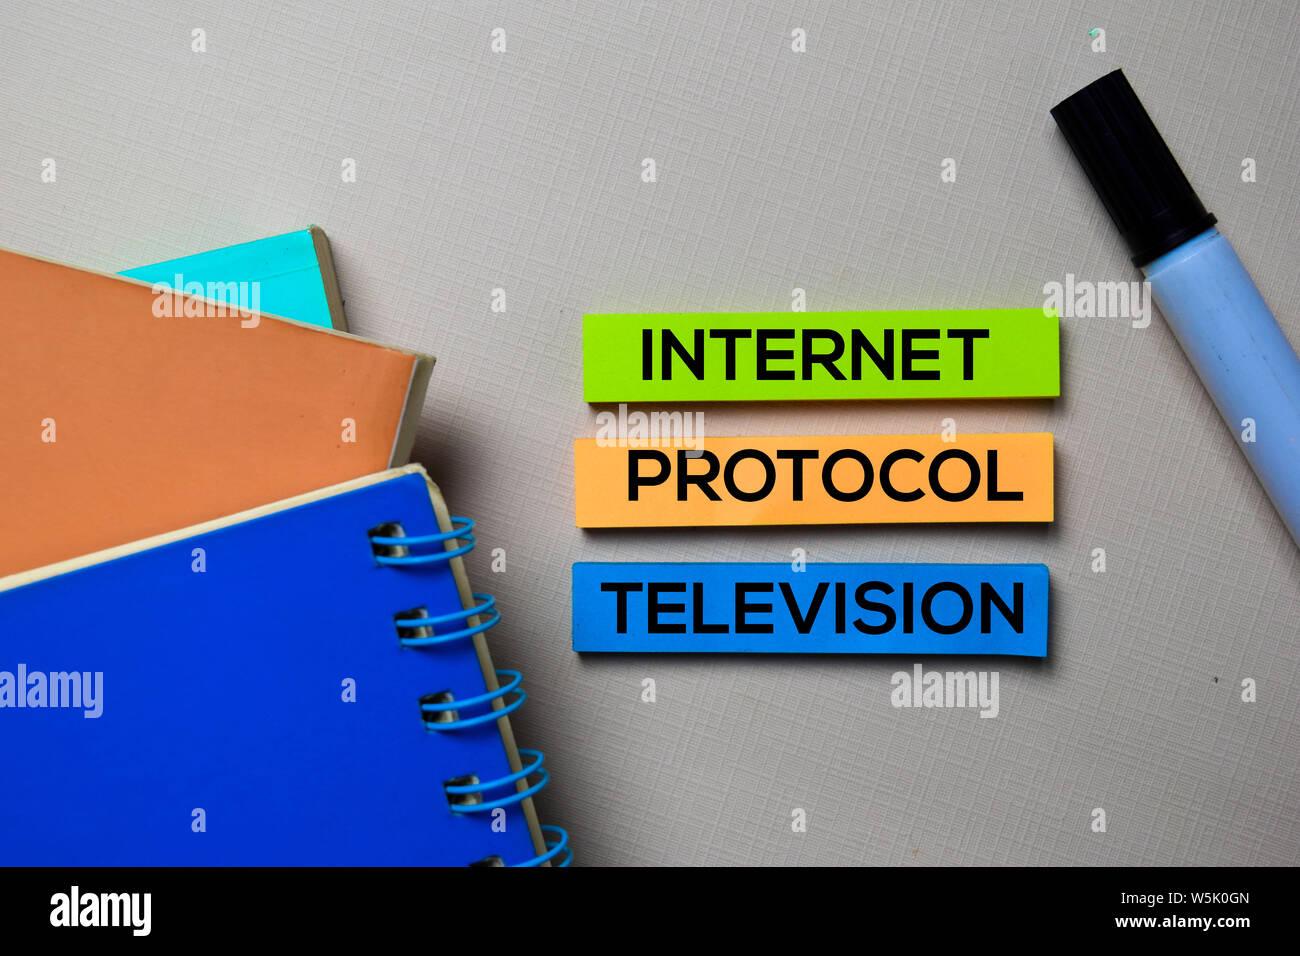 Iptv Stock Photos & Iptv Stock Images - Alamy